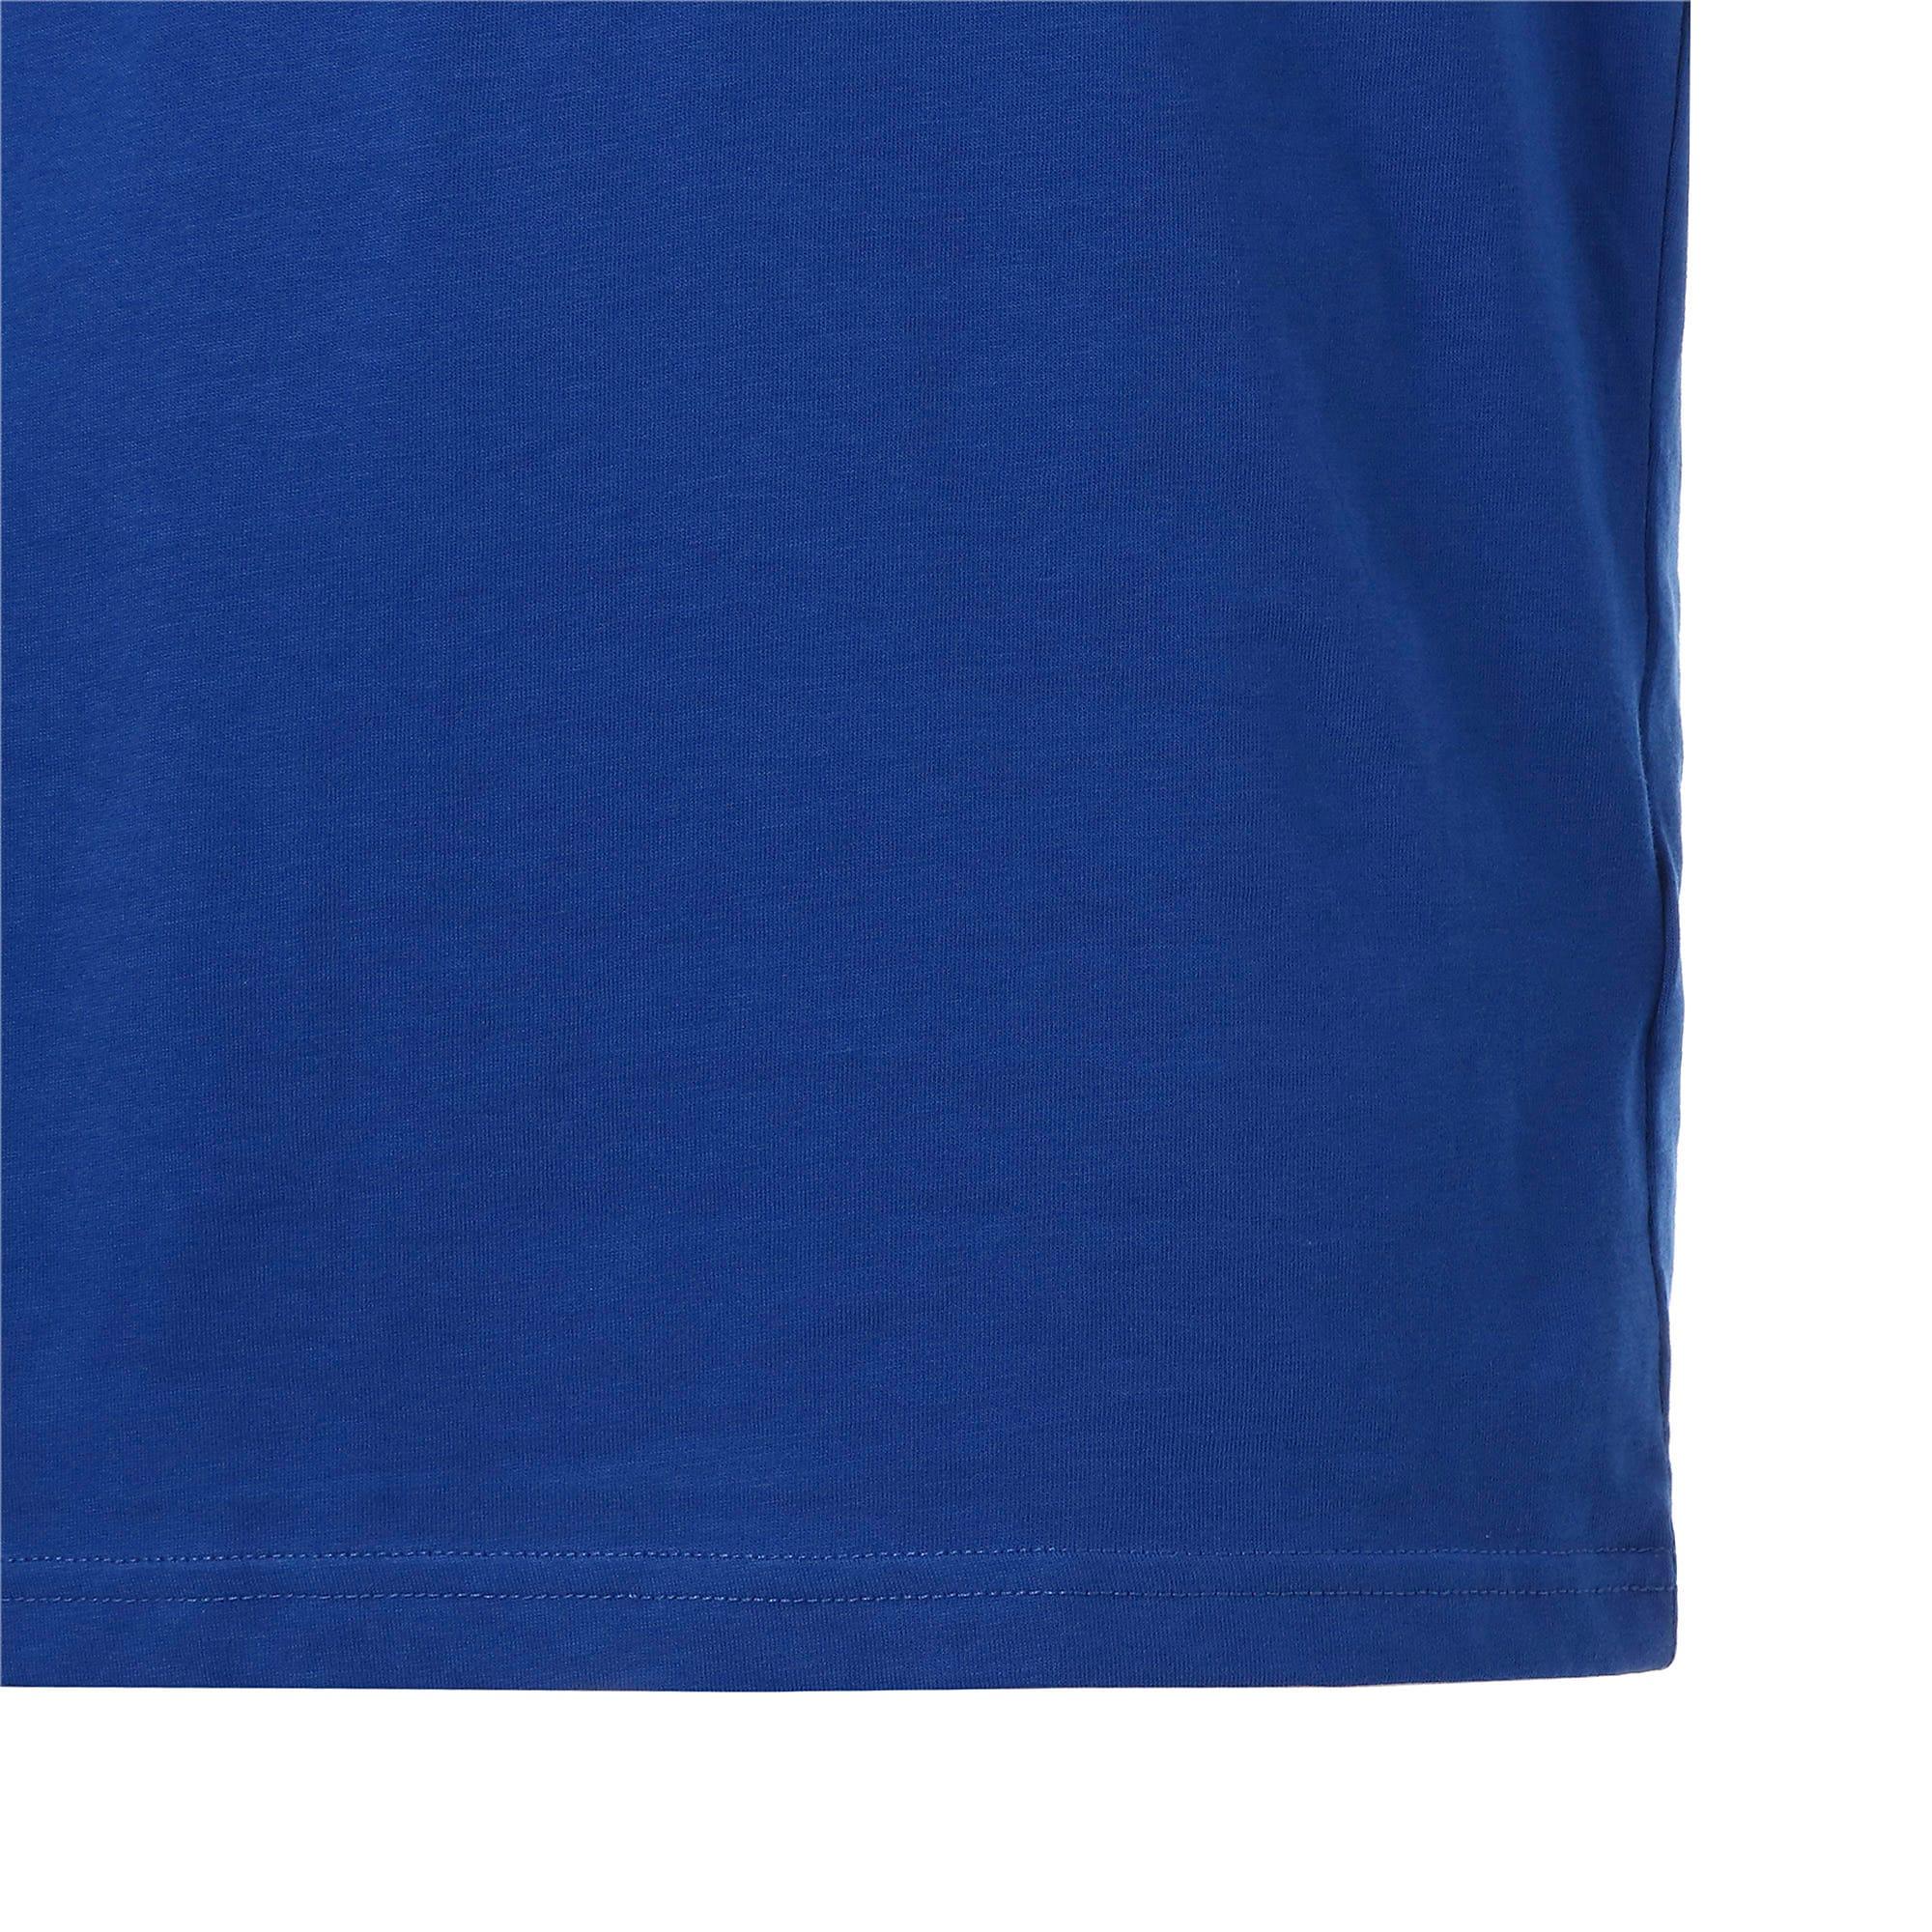 Thumbnail 9 of PUMA XTG グラフィック SS Tシャツ 半袖, Surf The Web, medium-JPN